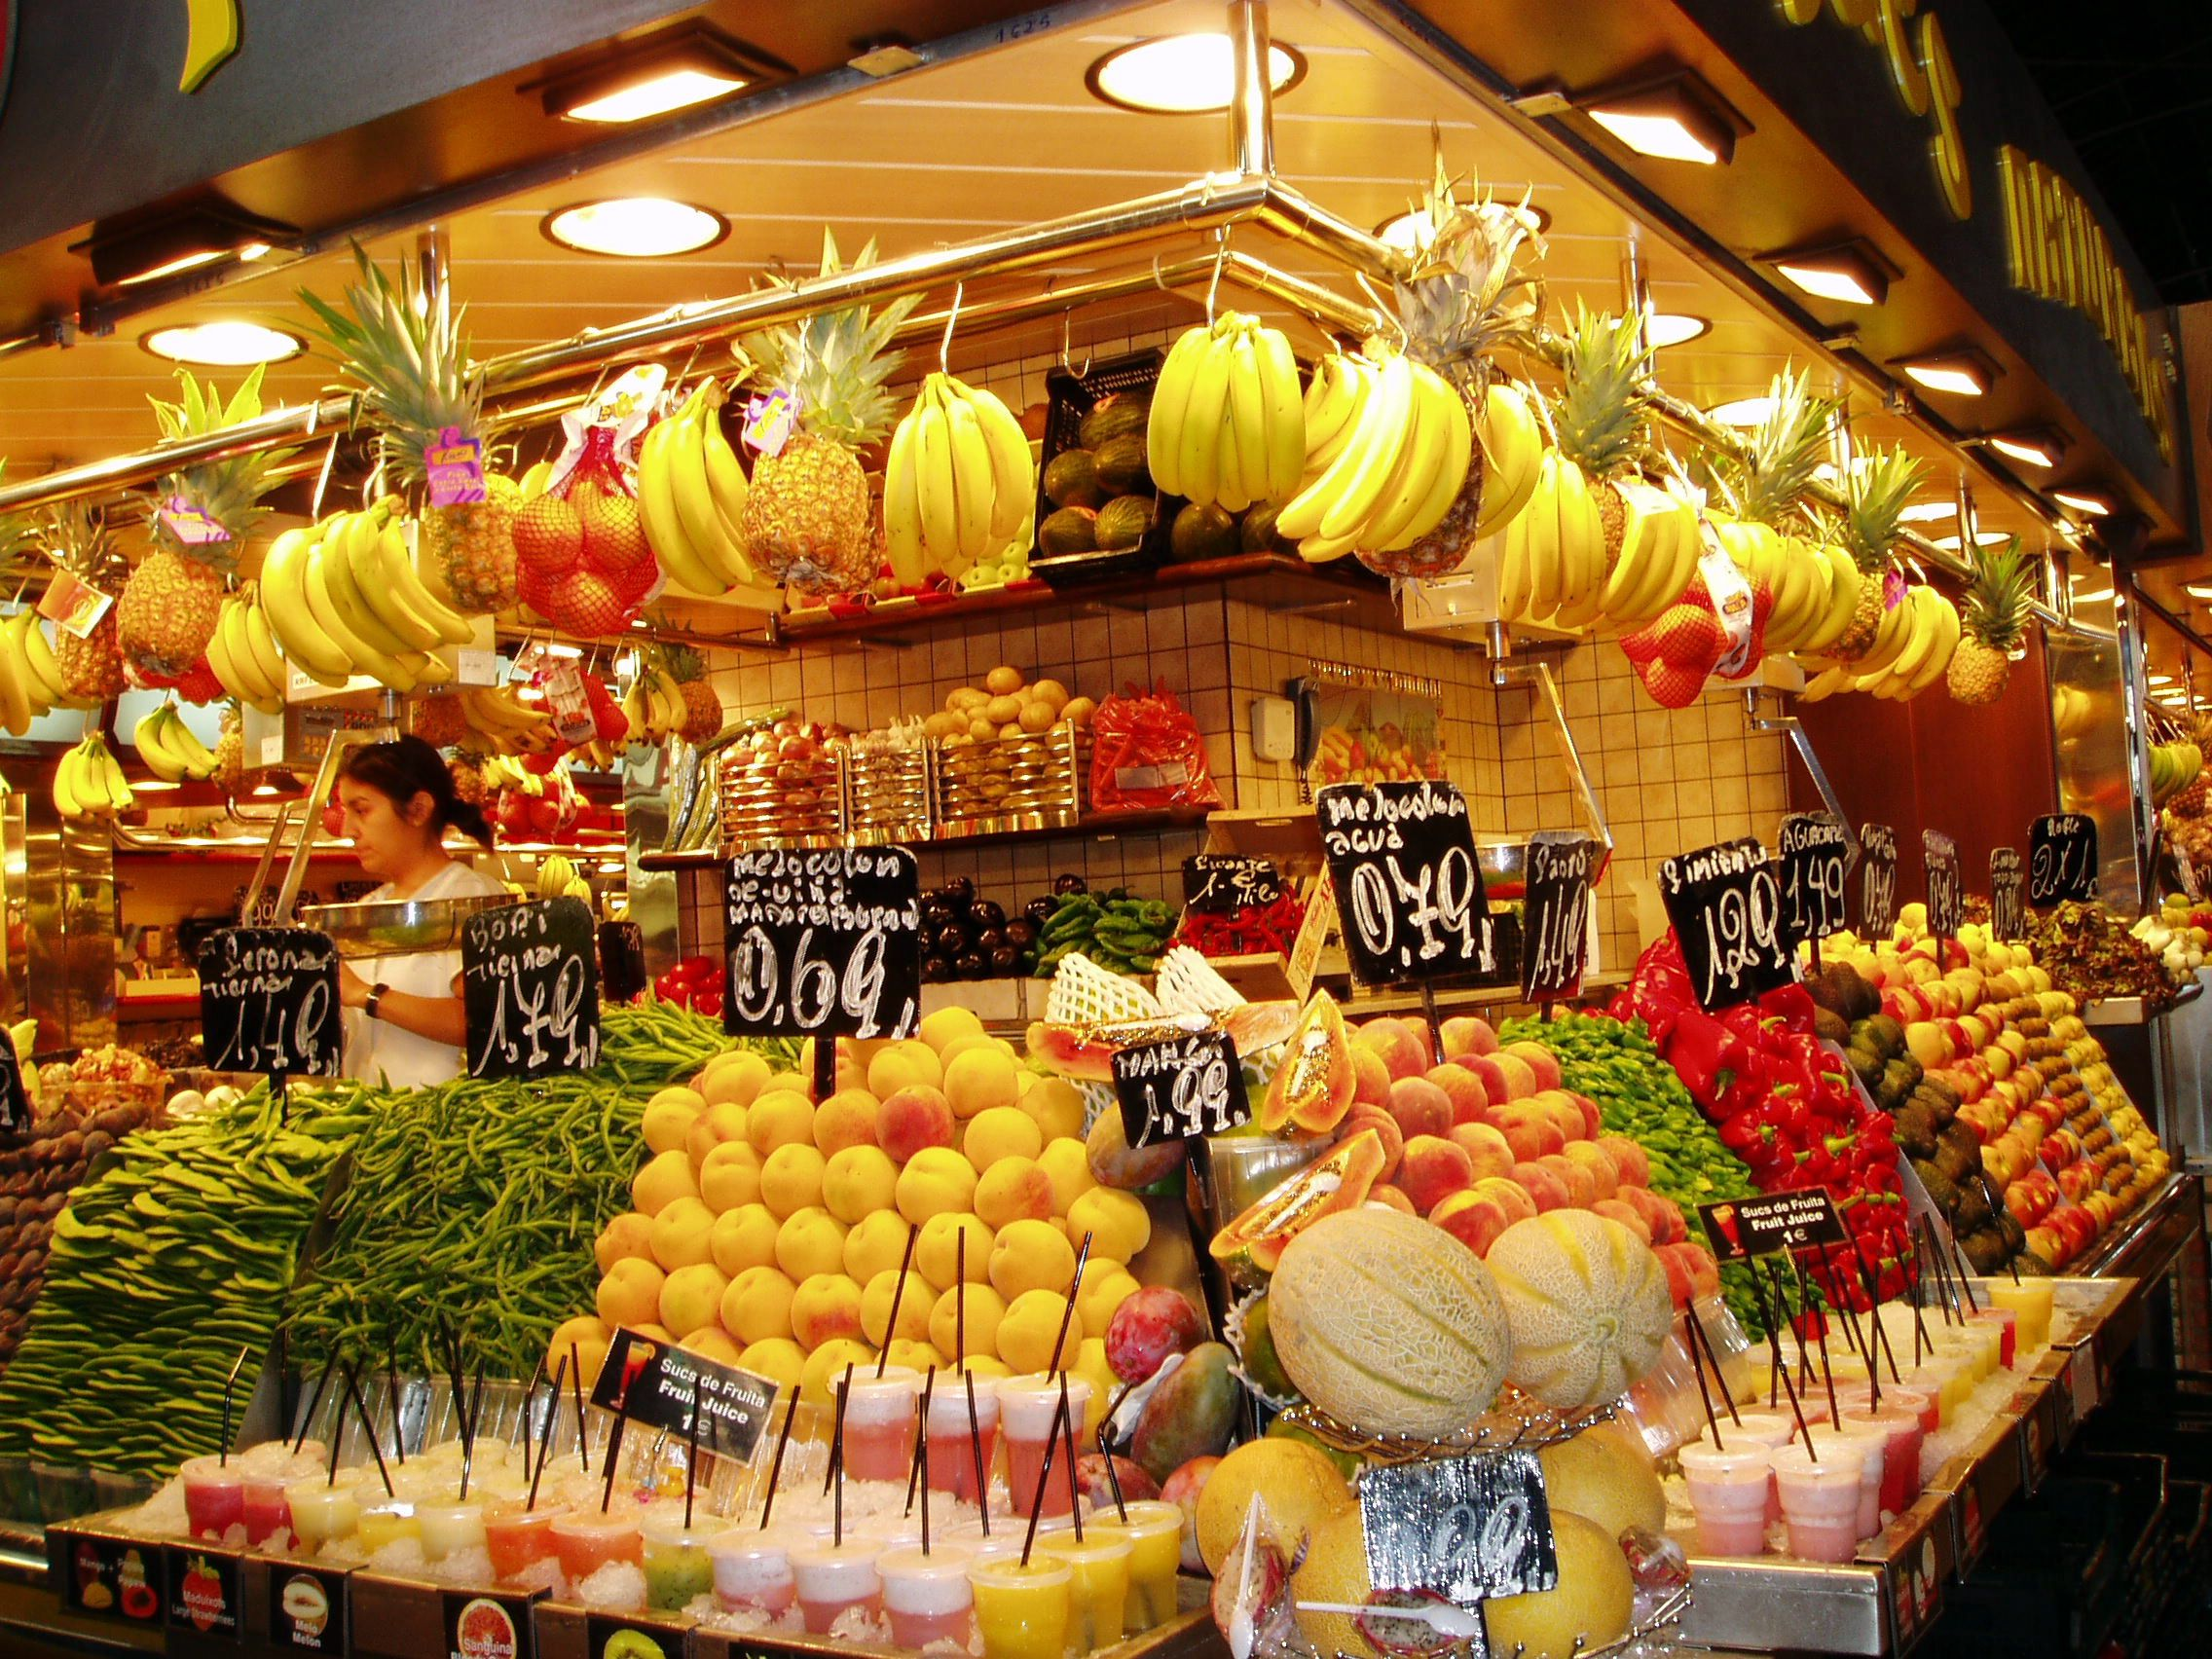 La Boqueria Market, Barcelona Spain | Favorite Places